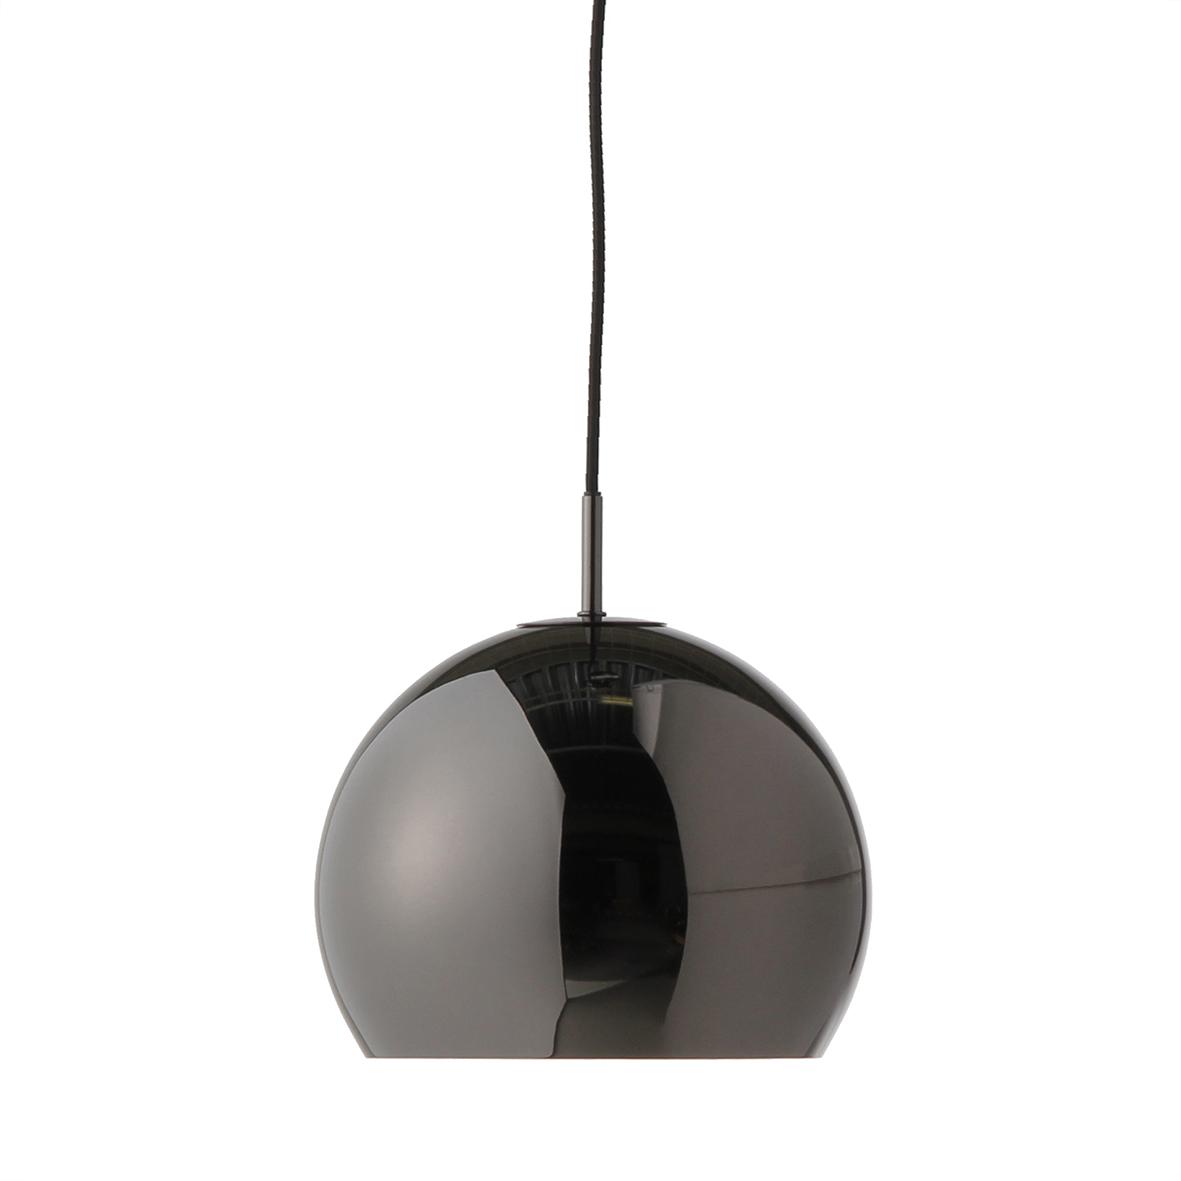 Lustra Ball Black Chrome Glossy Ø 25 Cm